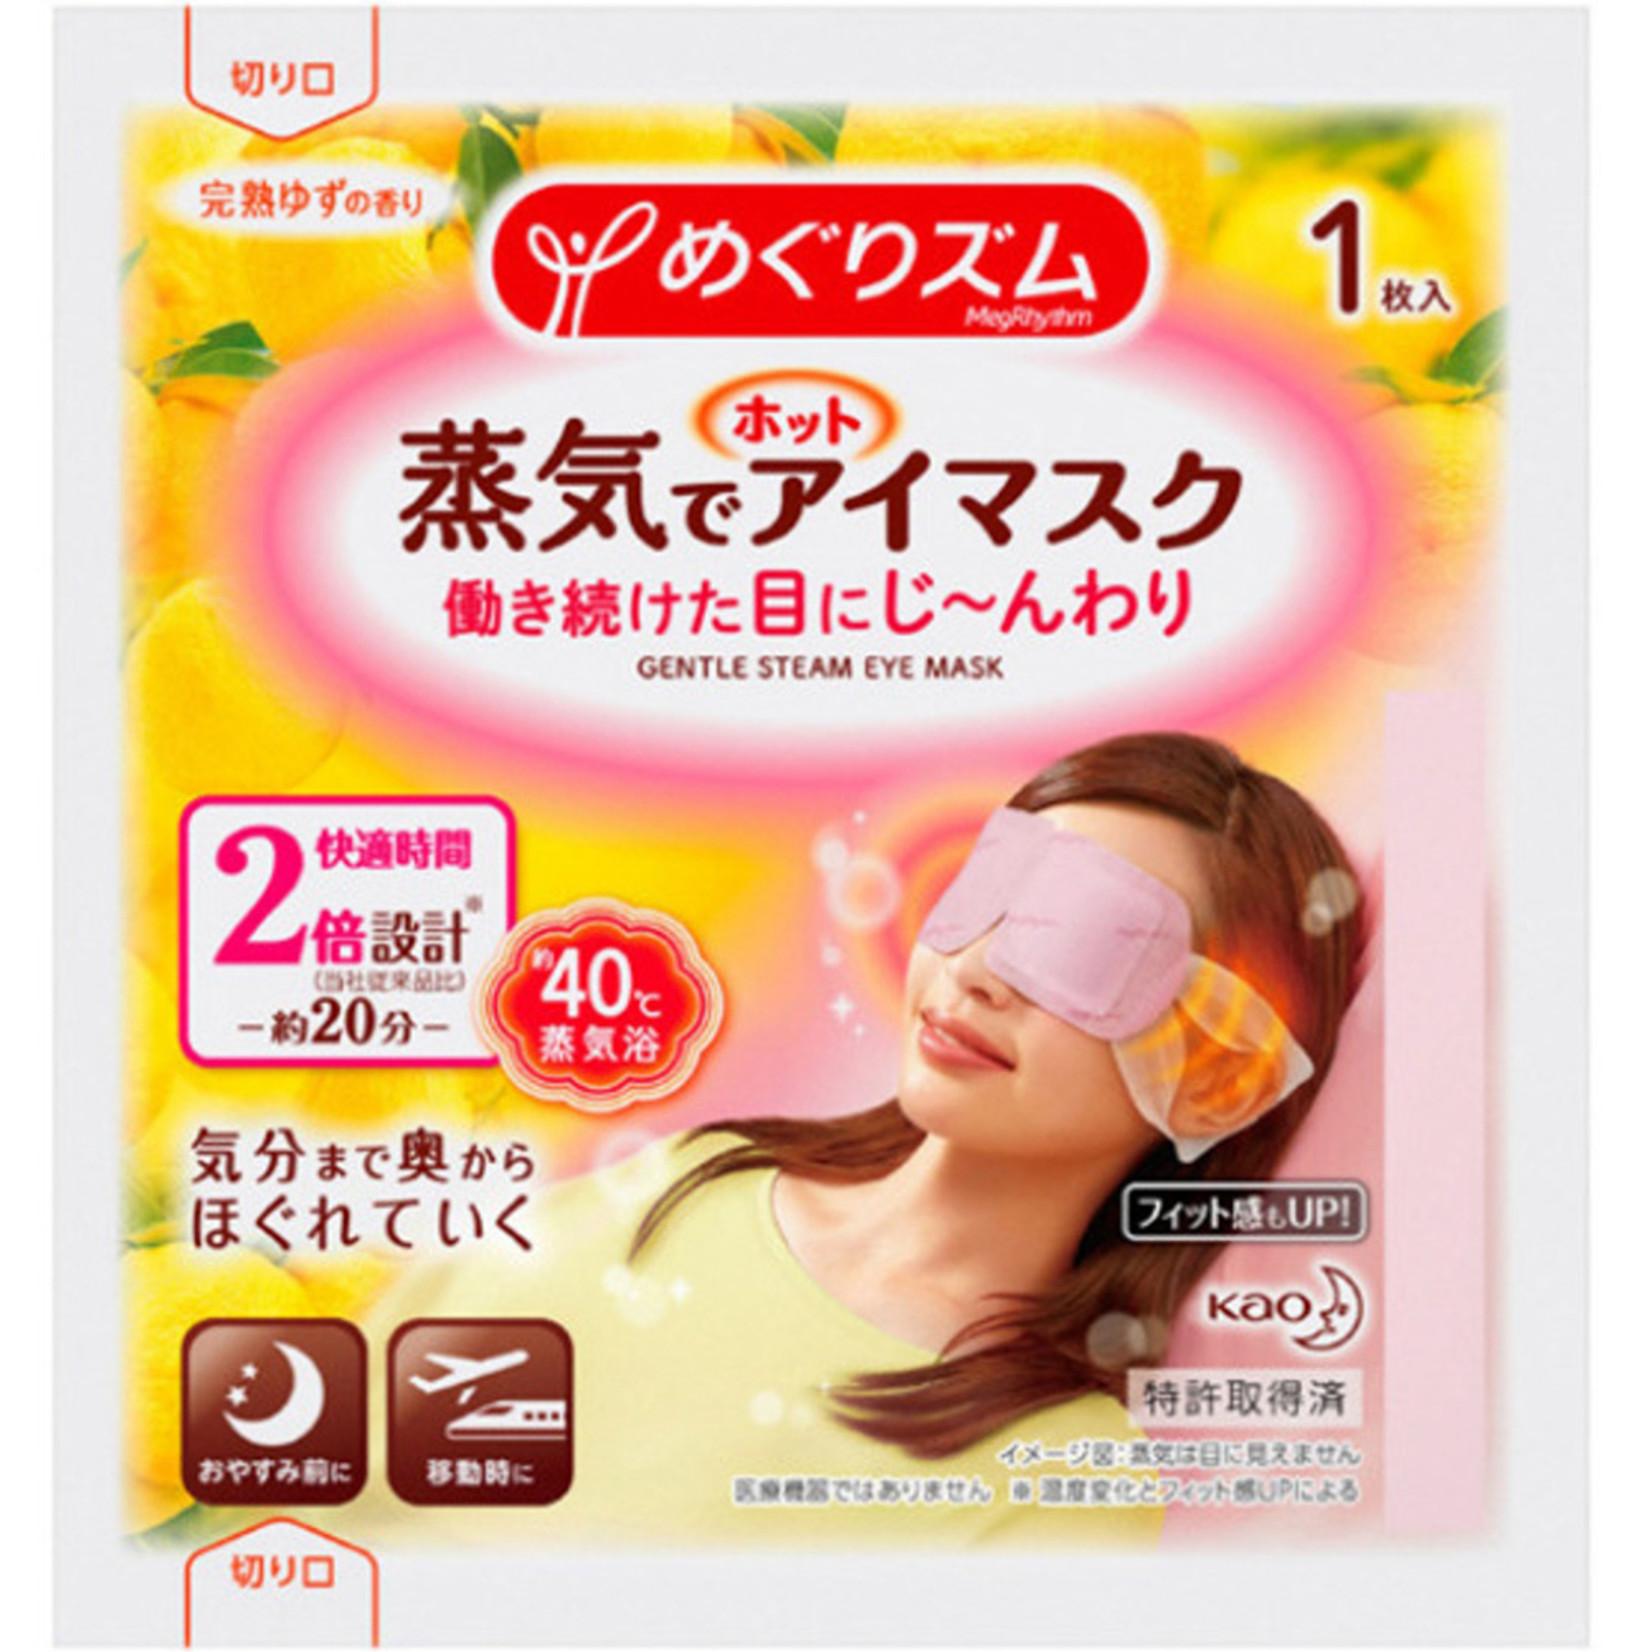 Kao MegRhythm Steam Eye Mask - Citrus (1 pc)